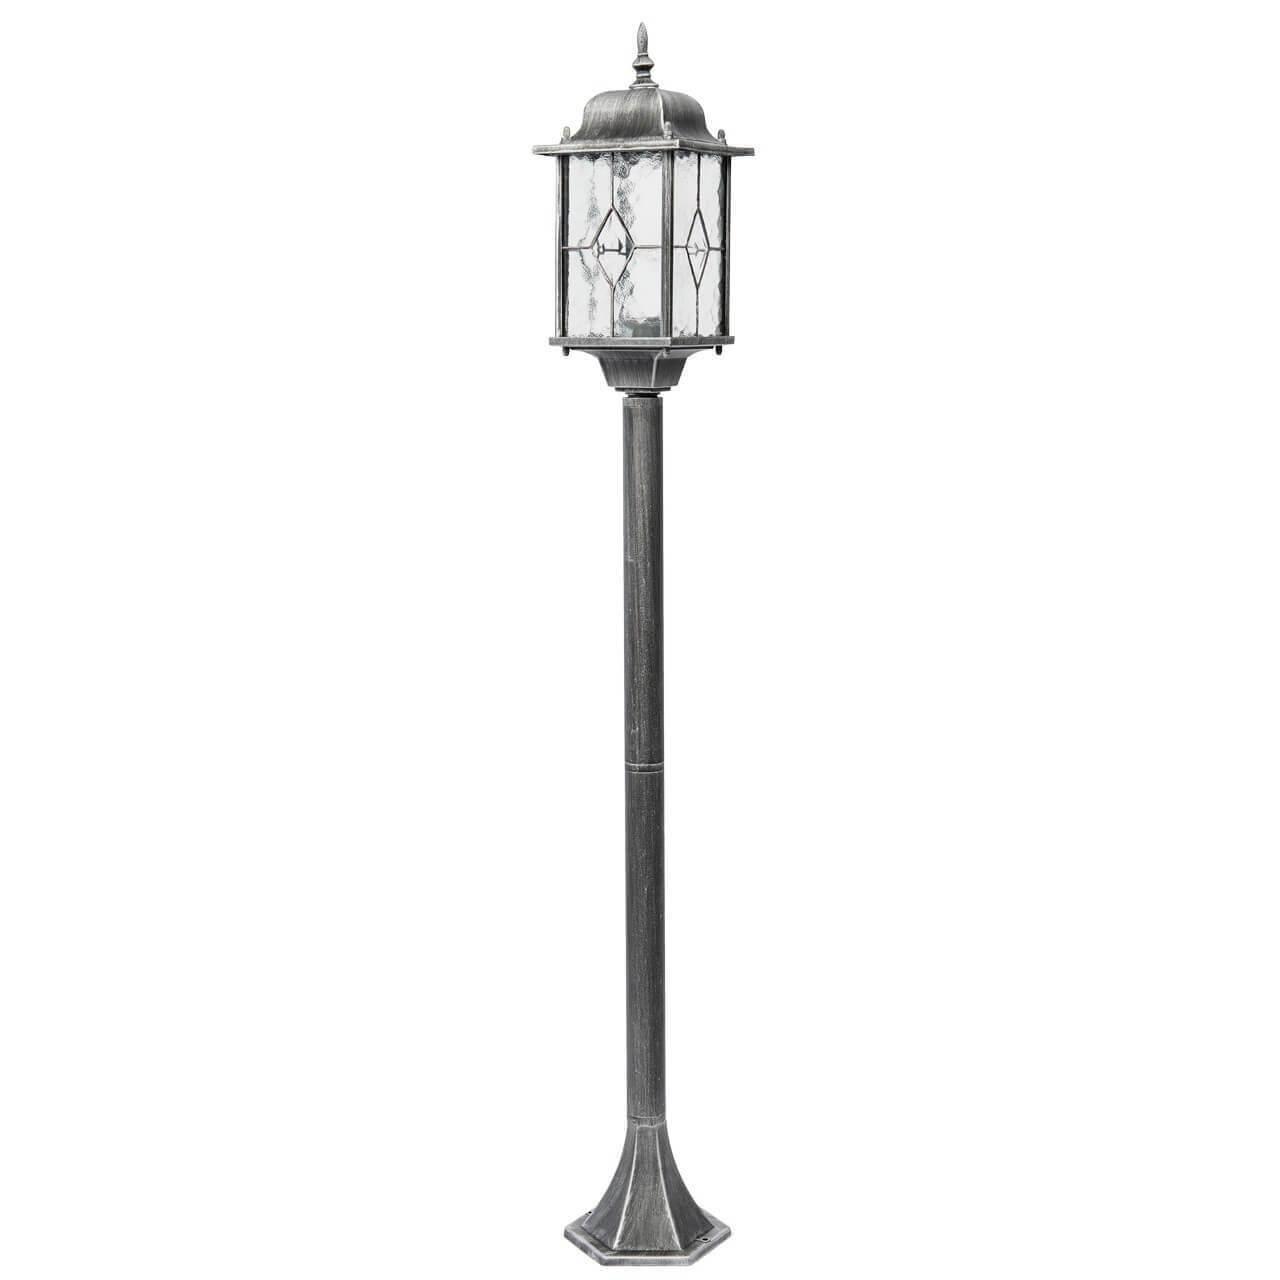 Уличный светильник De Markt Бургос 813040501